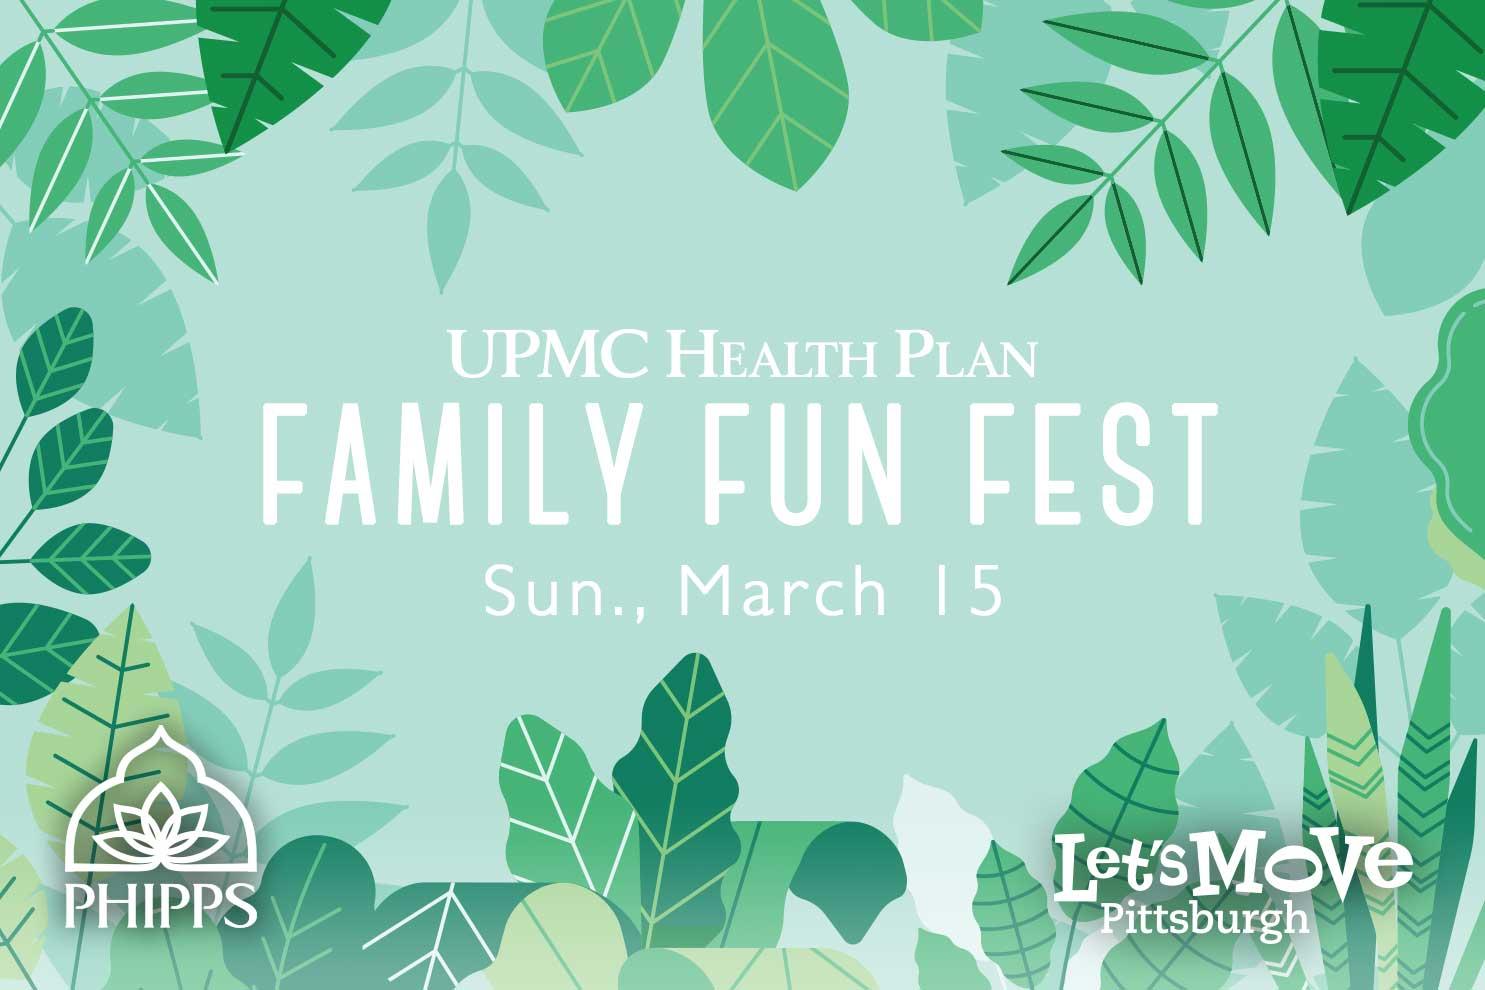 UPMC Family Fun Fest 2020